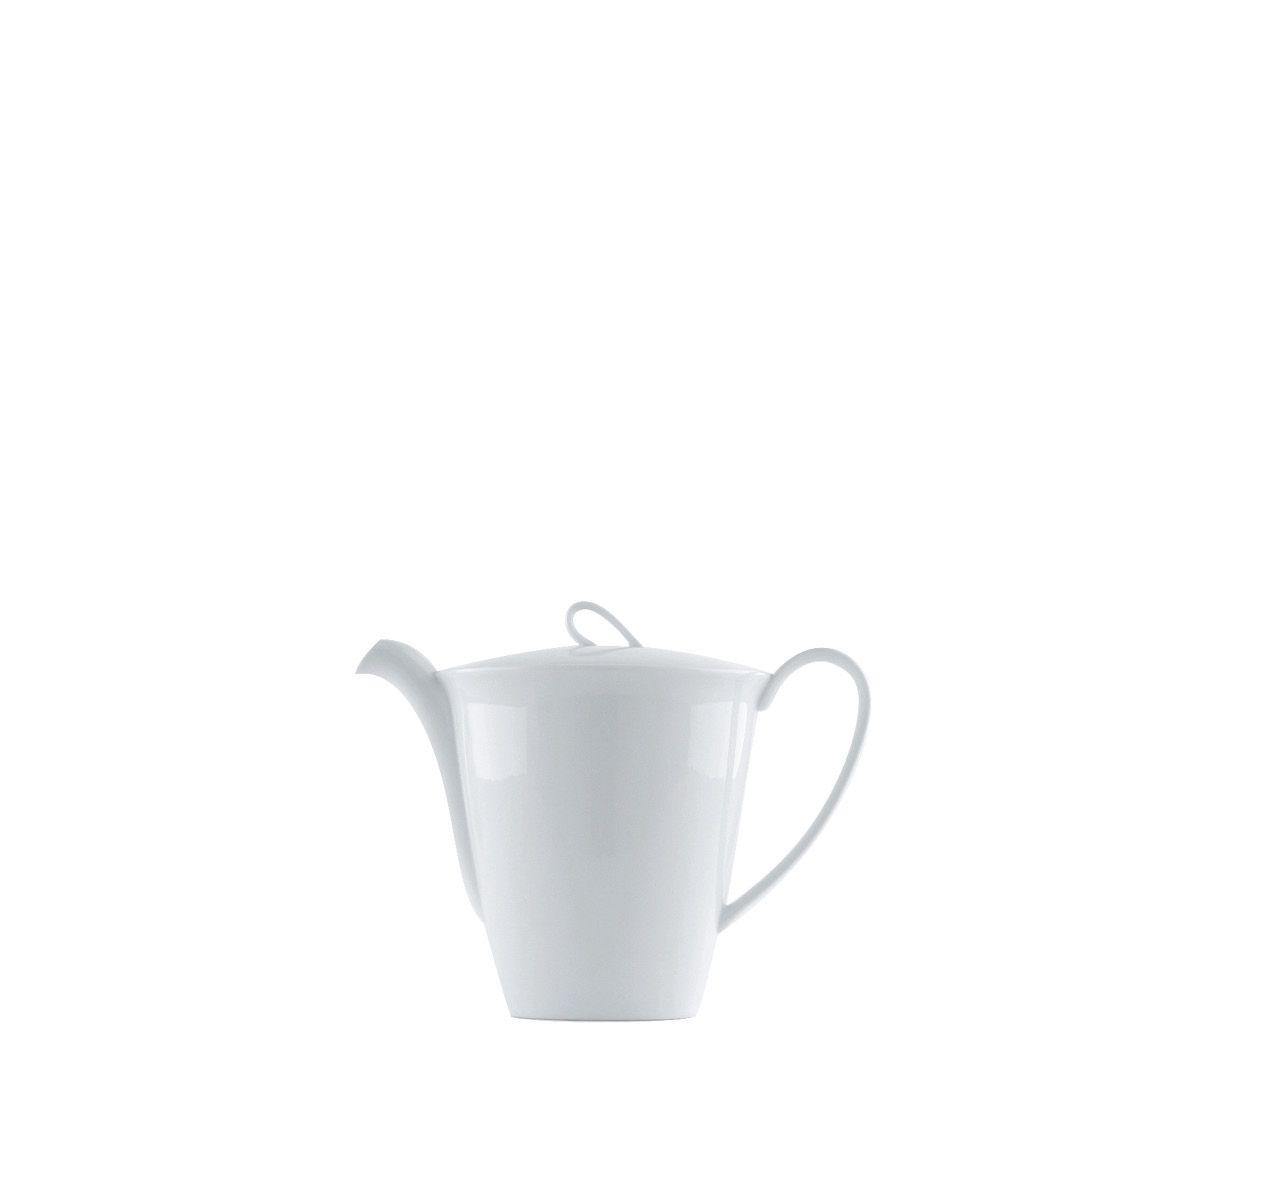 The White Snow - Tea Pot Porcelain